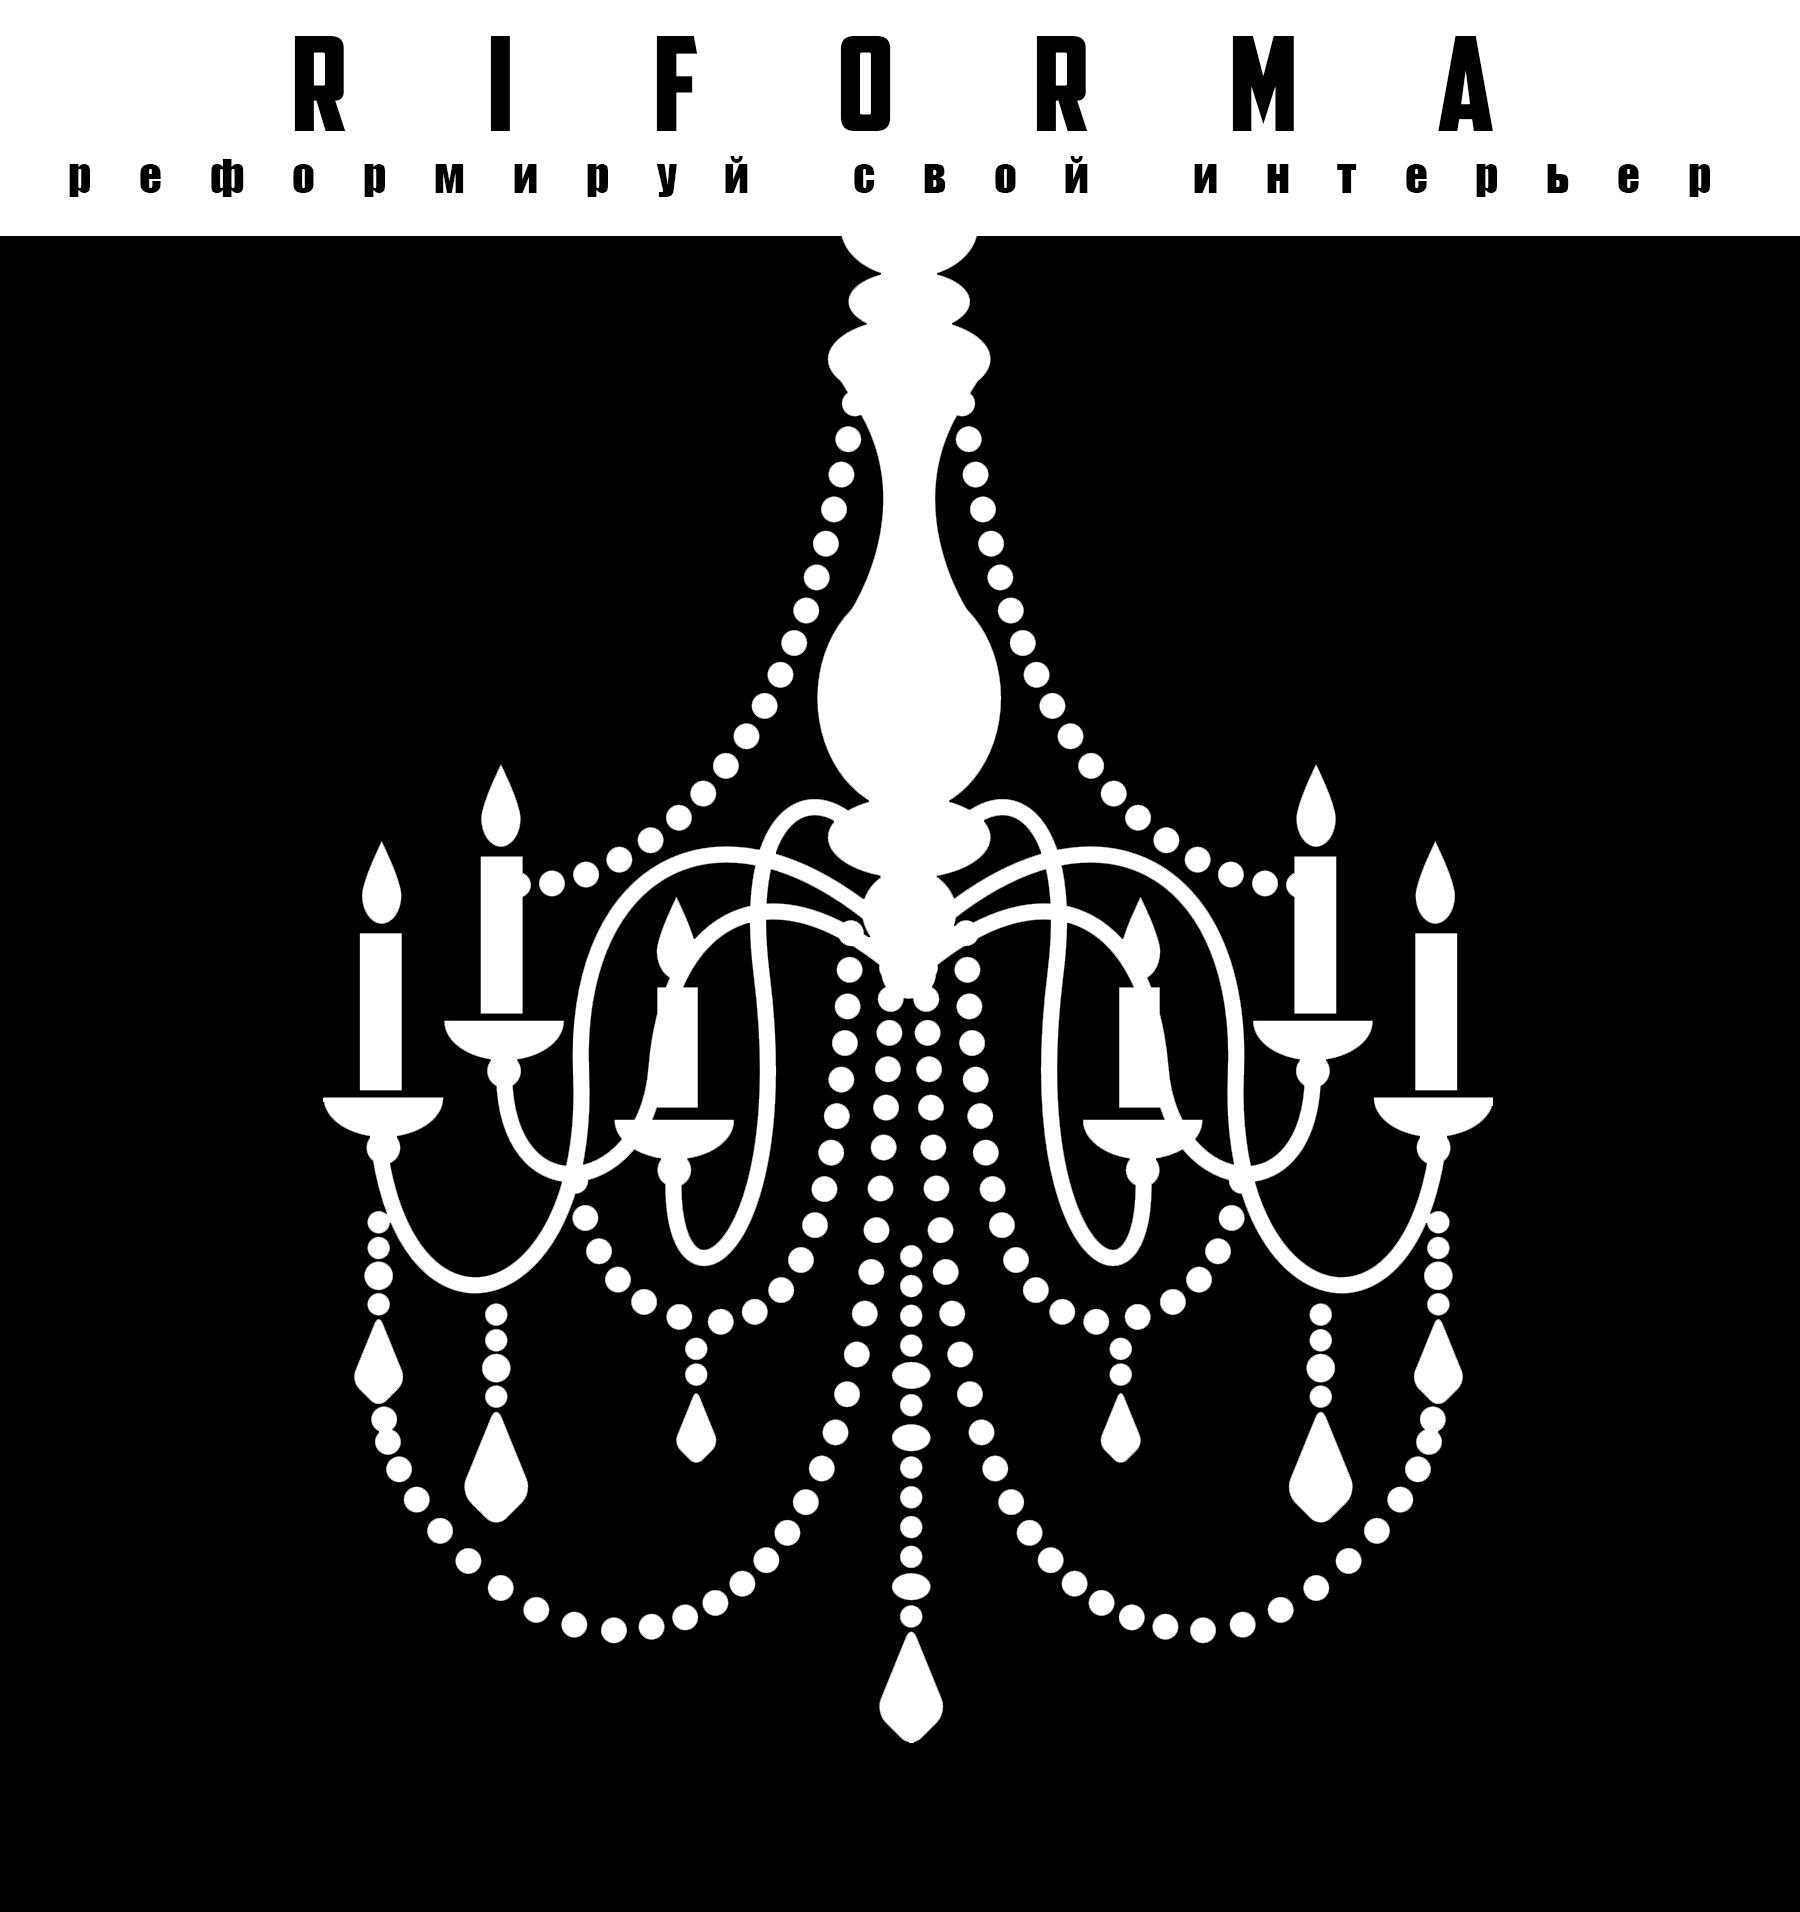 Разработка логотипа и элементов фирменного стиля фото f_5785794ea59c9edc.jpg